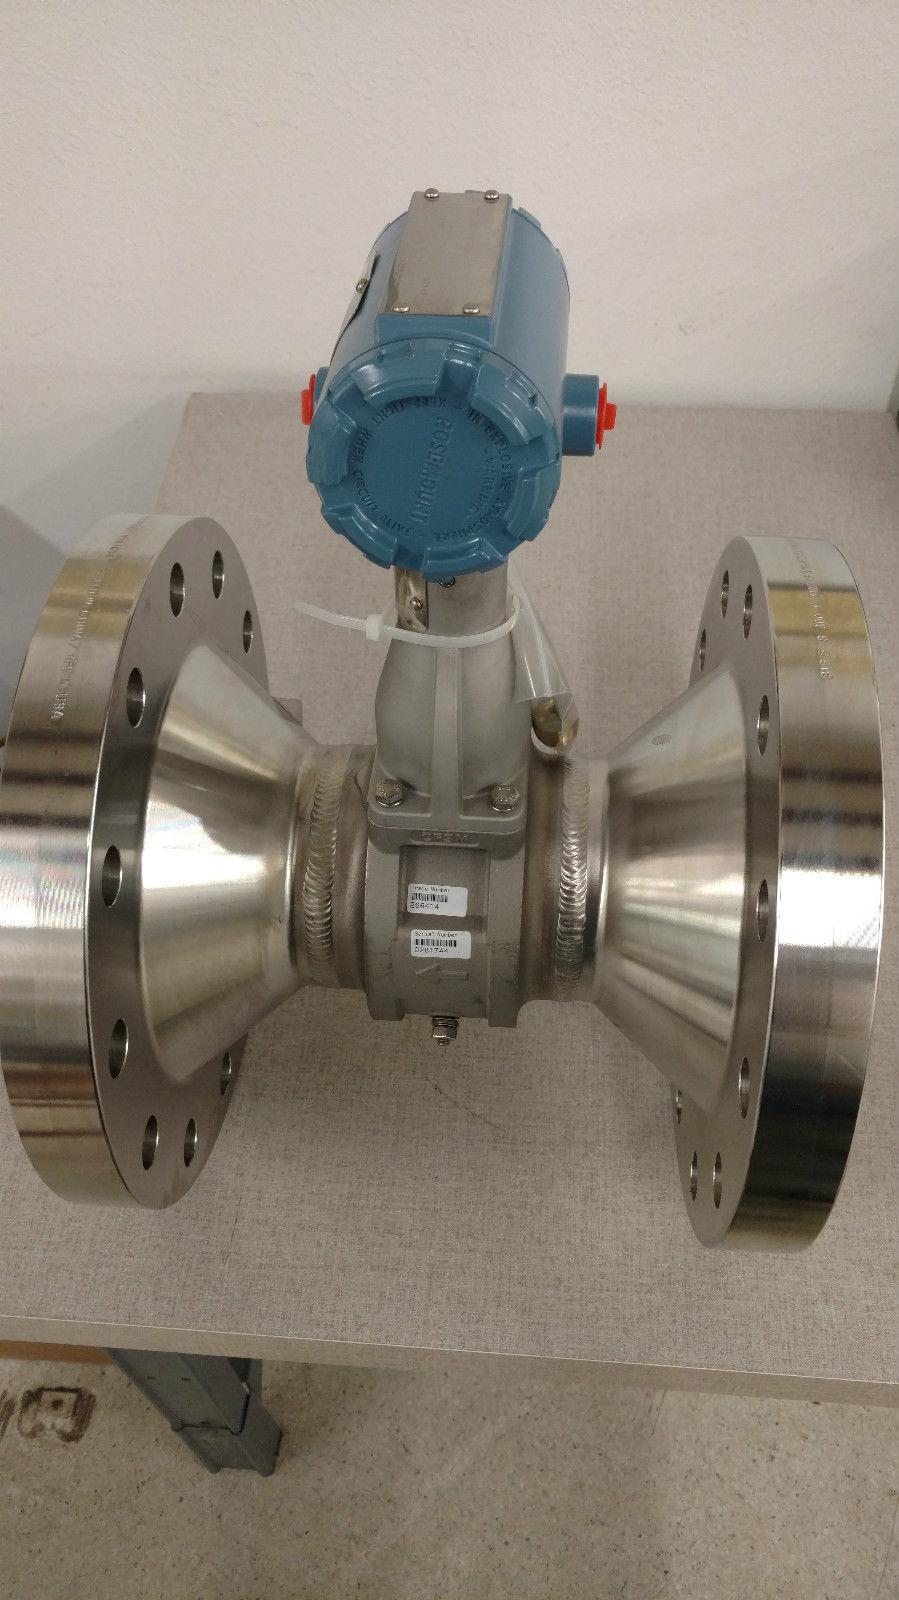 Rosemount Vortex Flow Meter 8800DR060SA3N1D1E5 06in Class 300